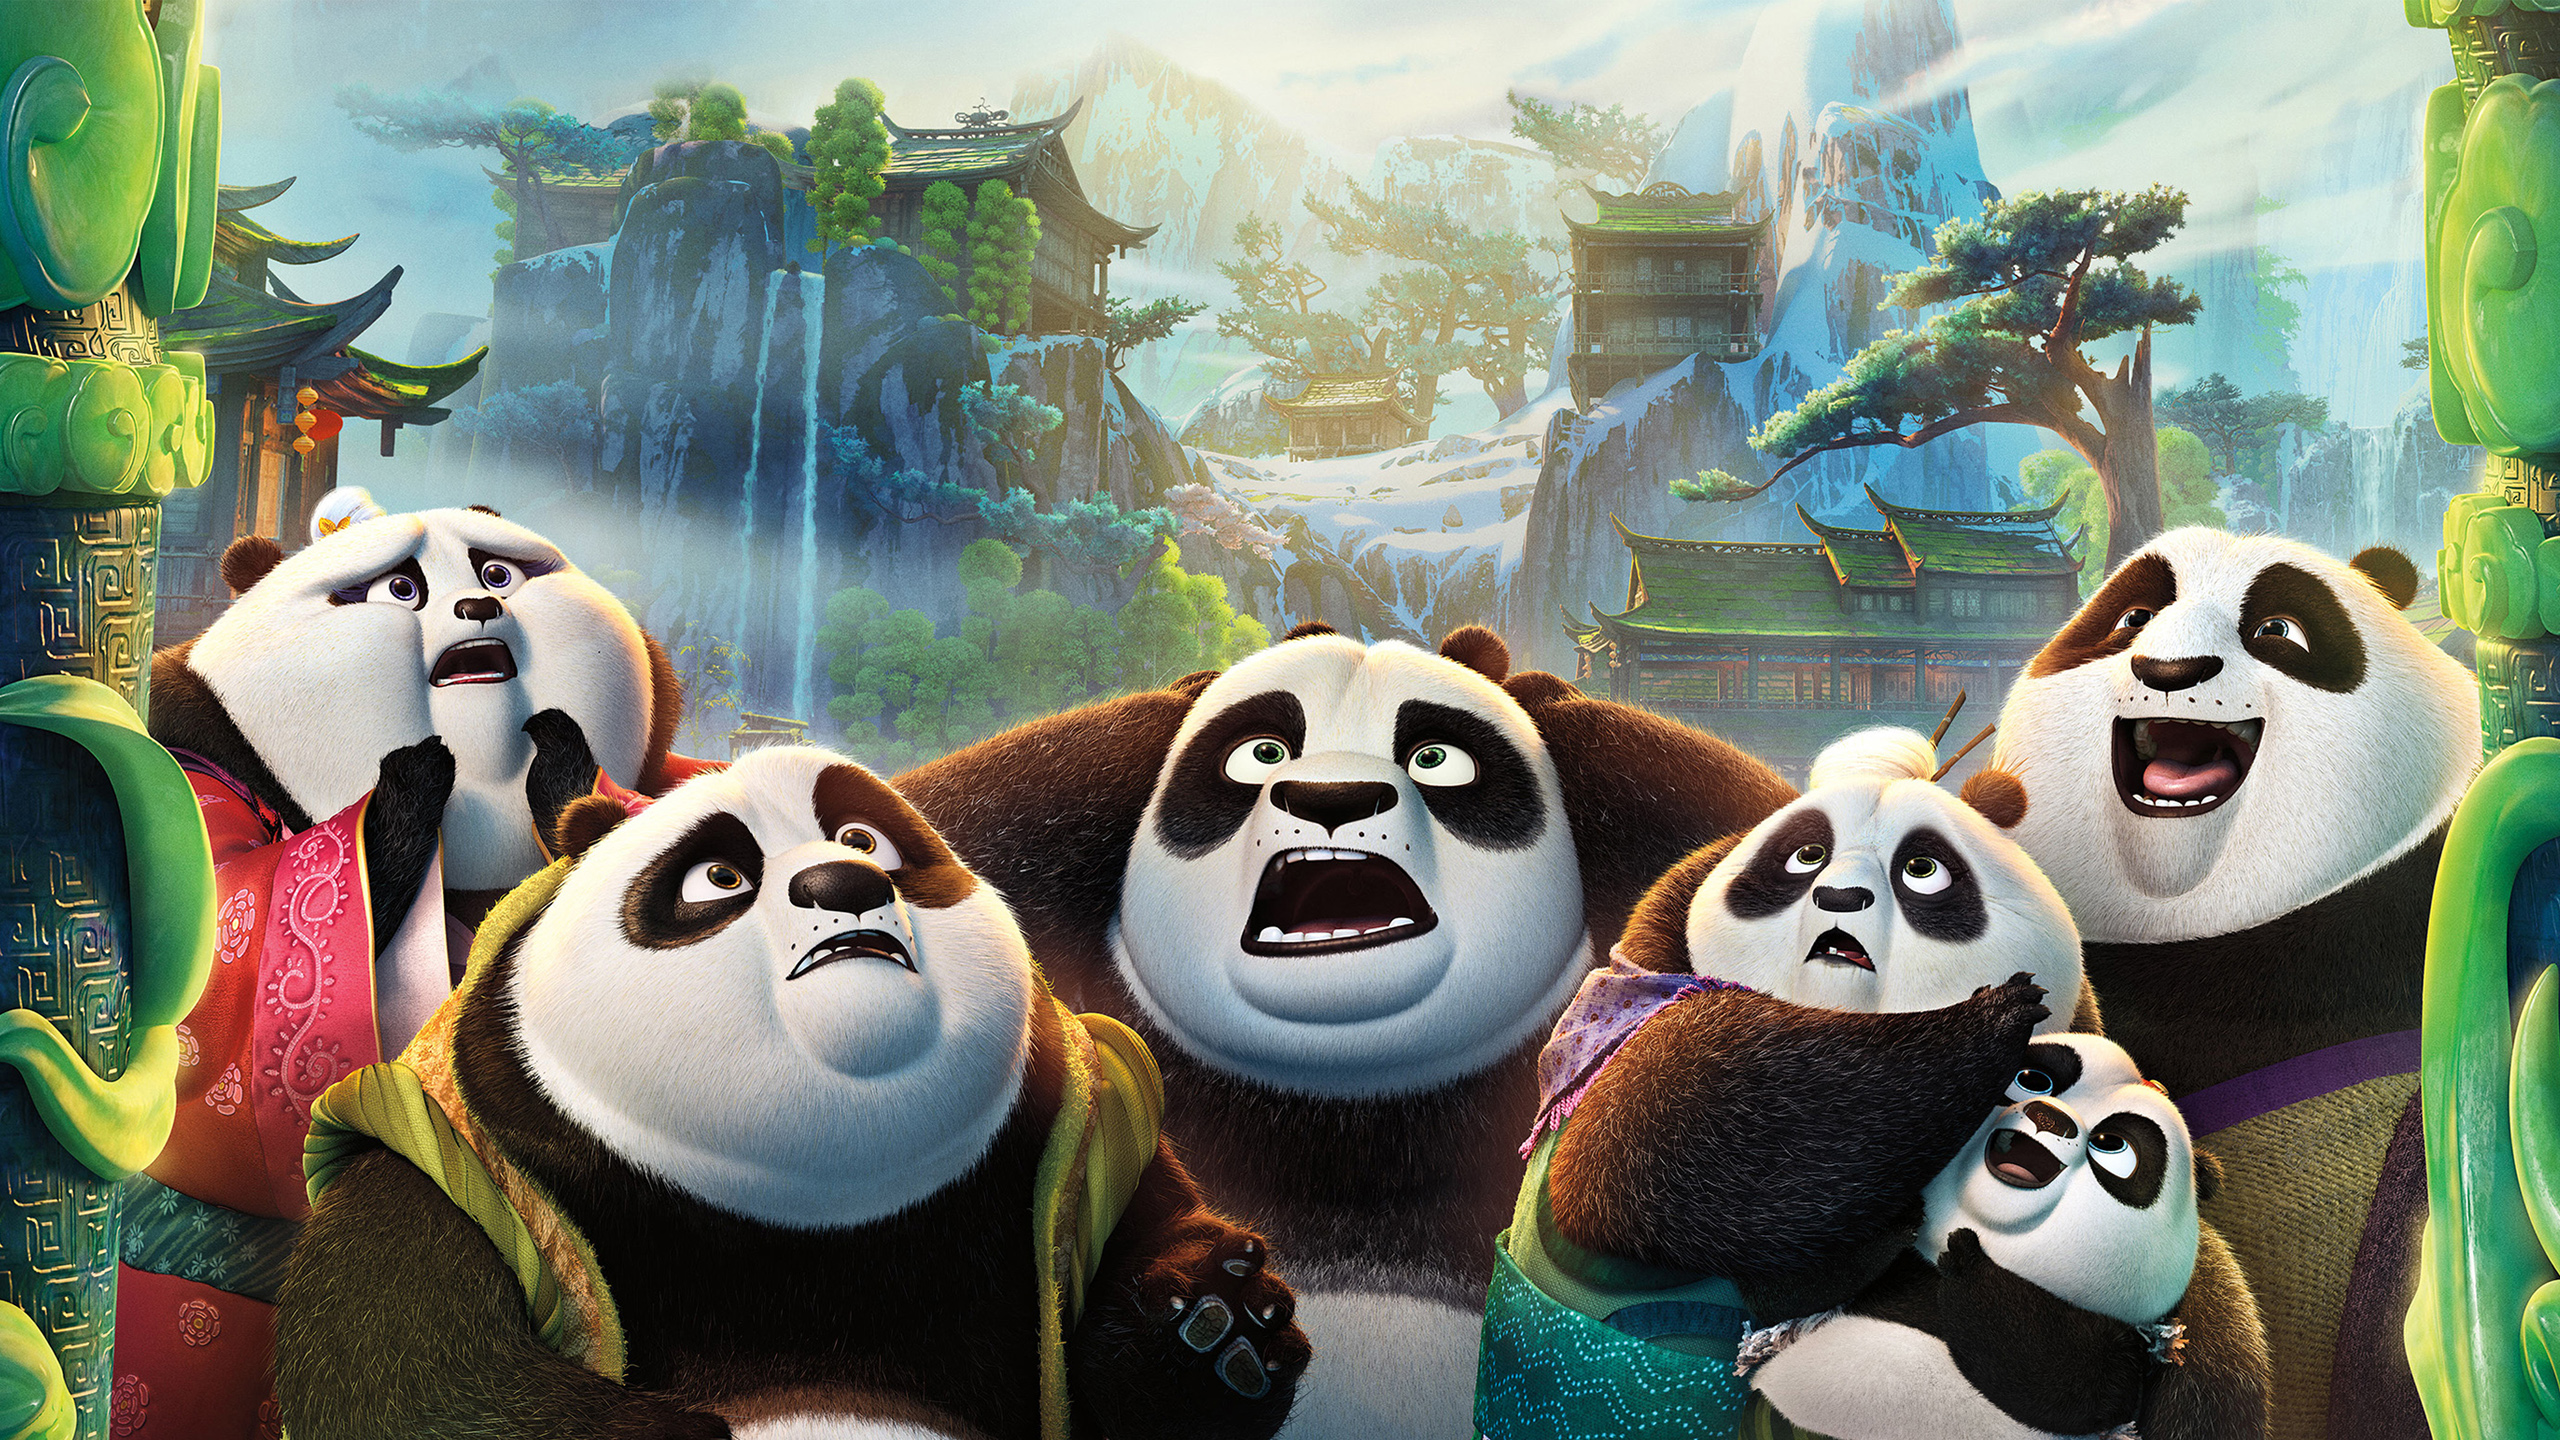 kung fu panda 3 wallpaper background hd 49413